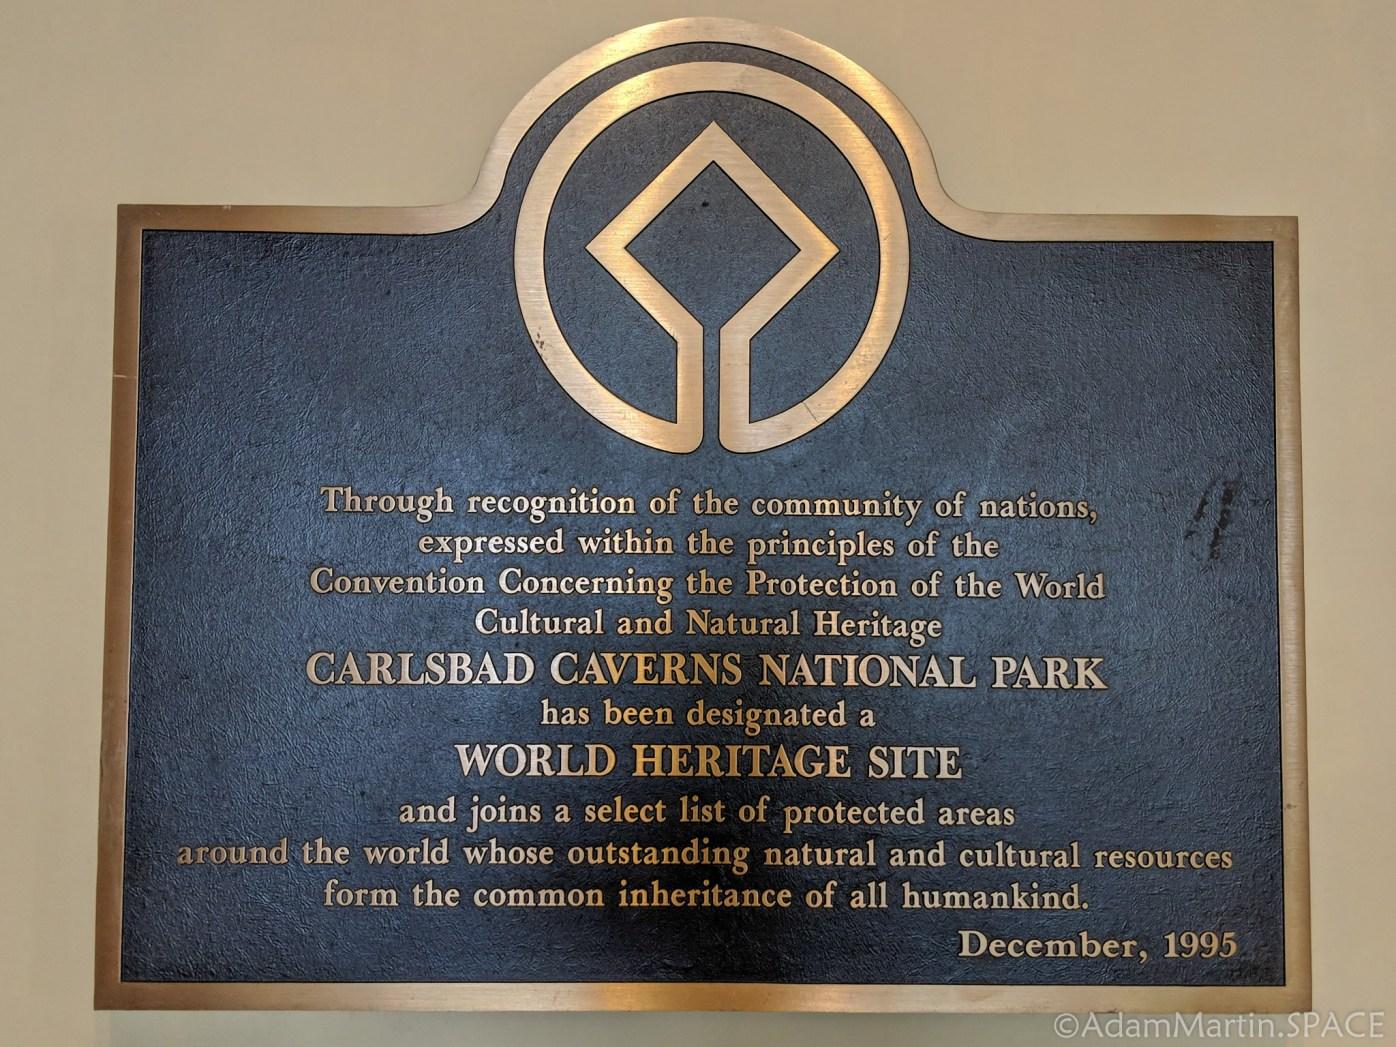 Carlsbad Caverns National Park - World Heritage Site